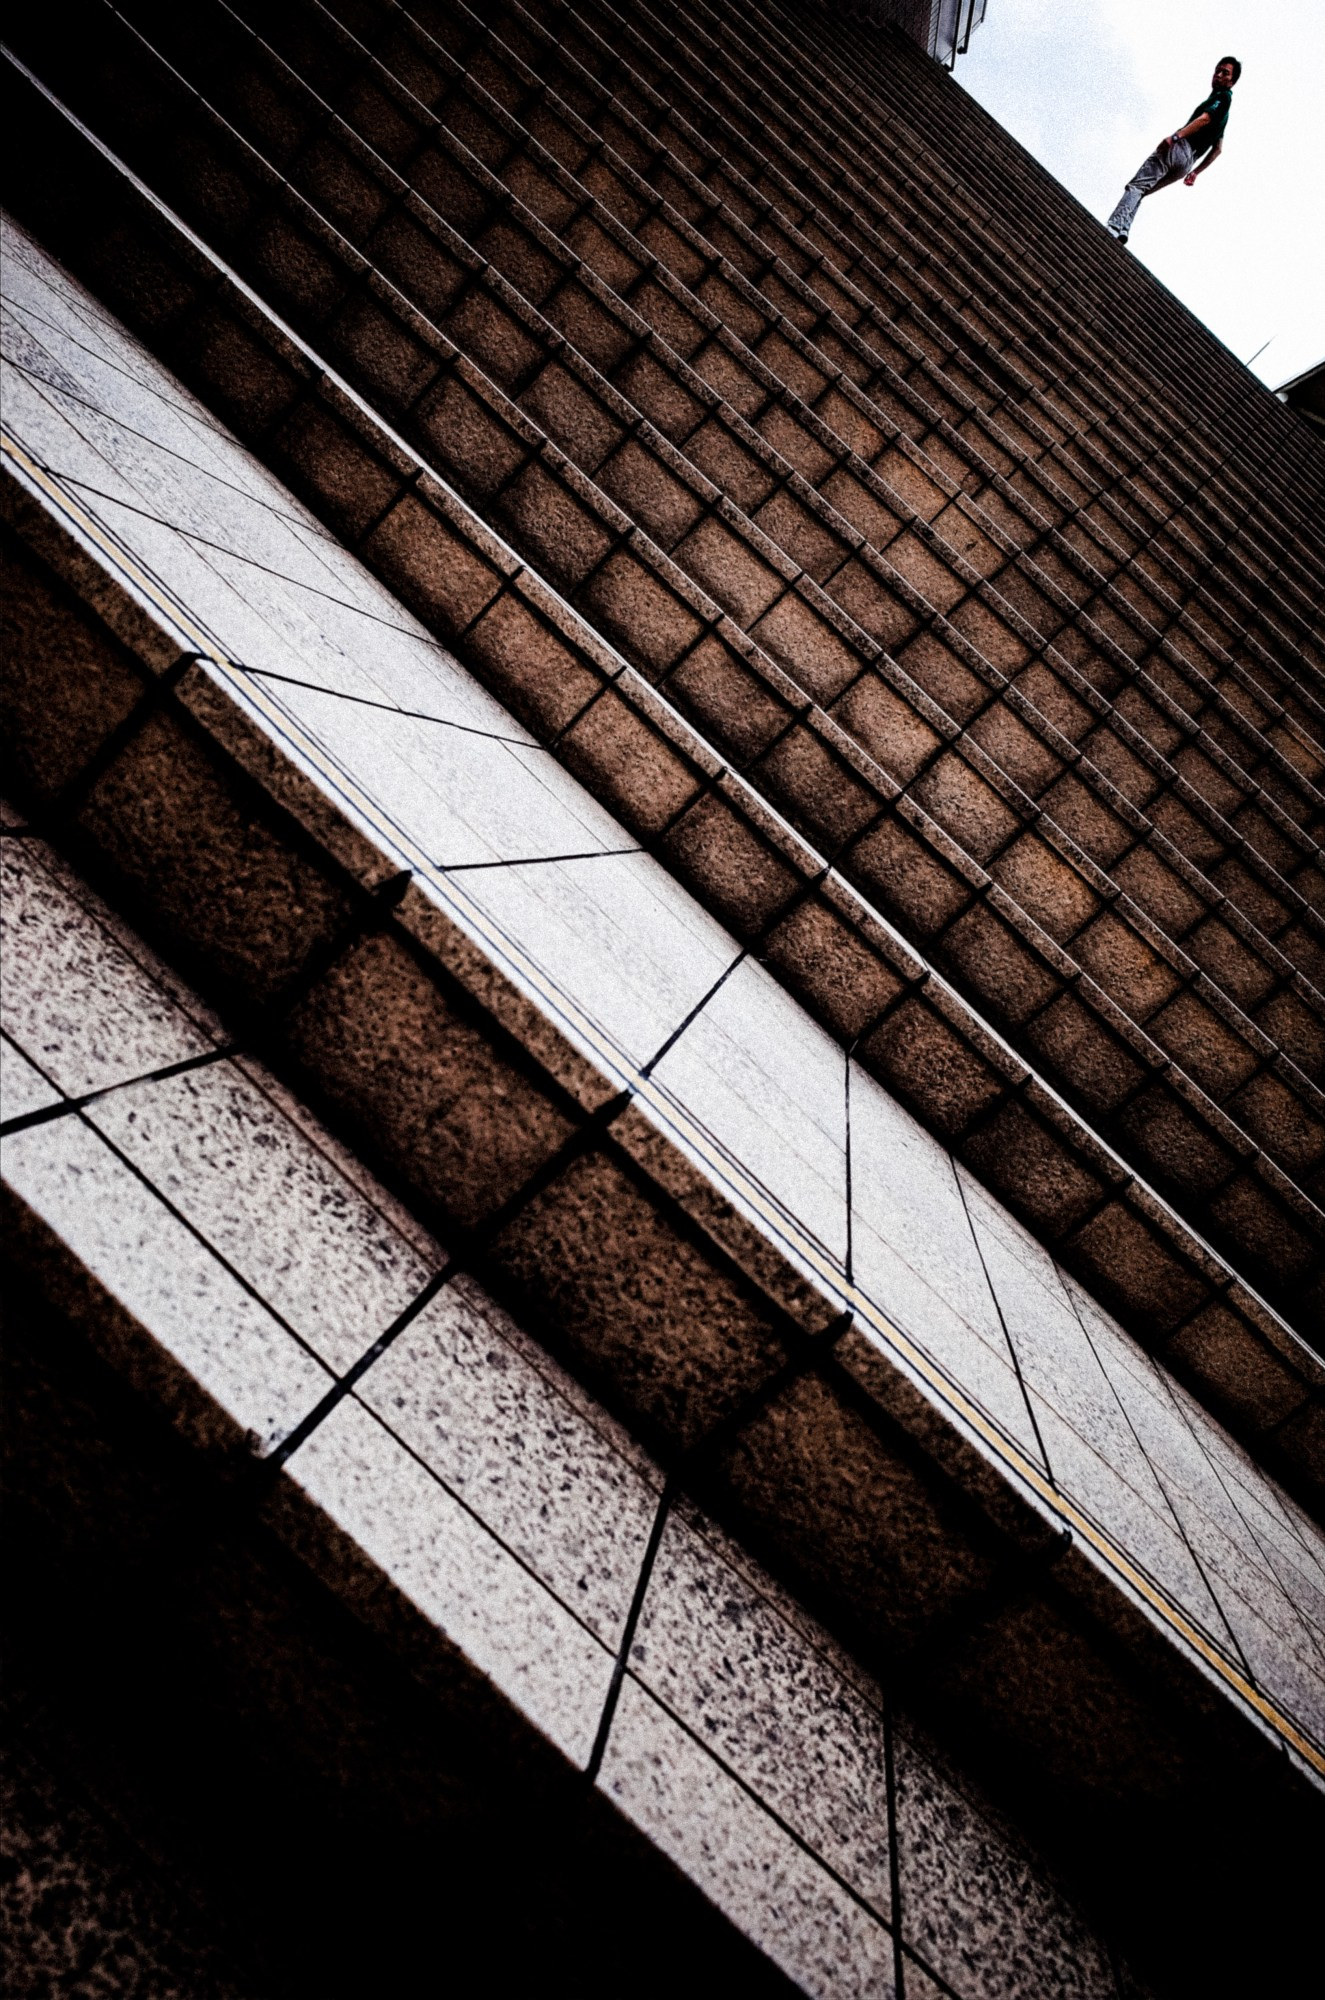 Dutch angle. Diagonal tilt. Tokyo, 2018